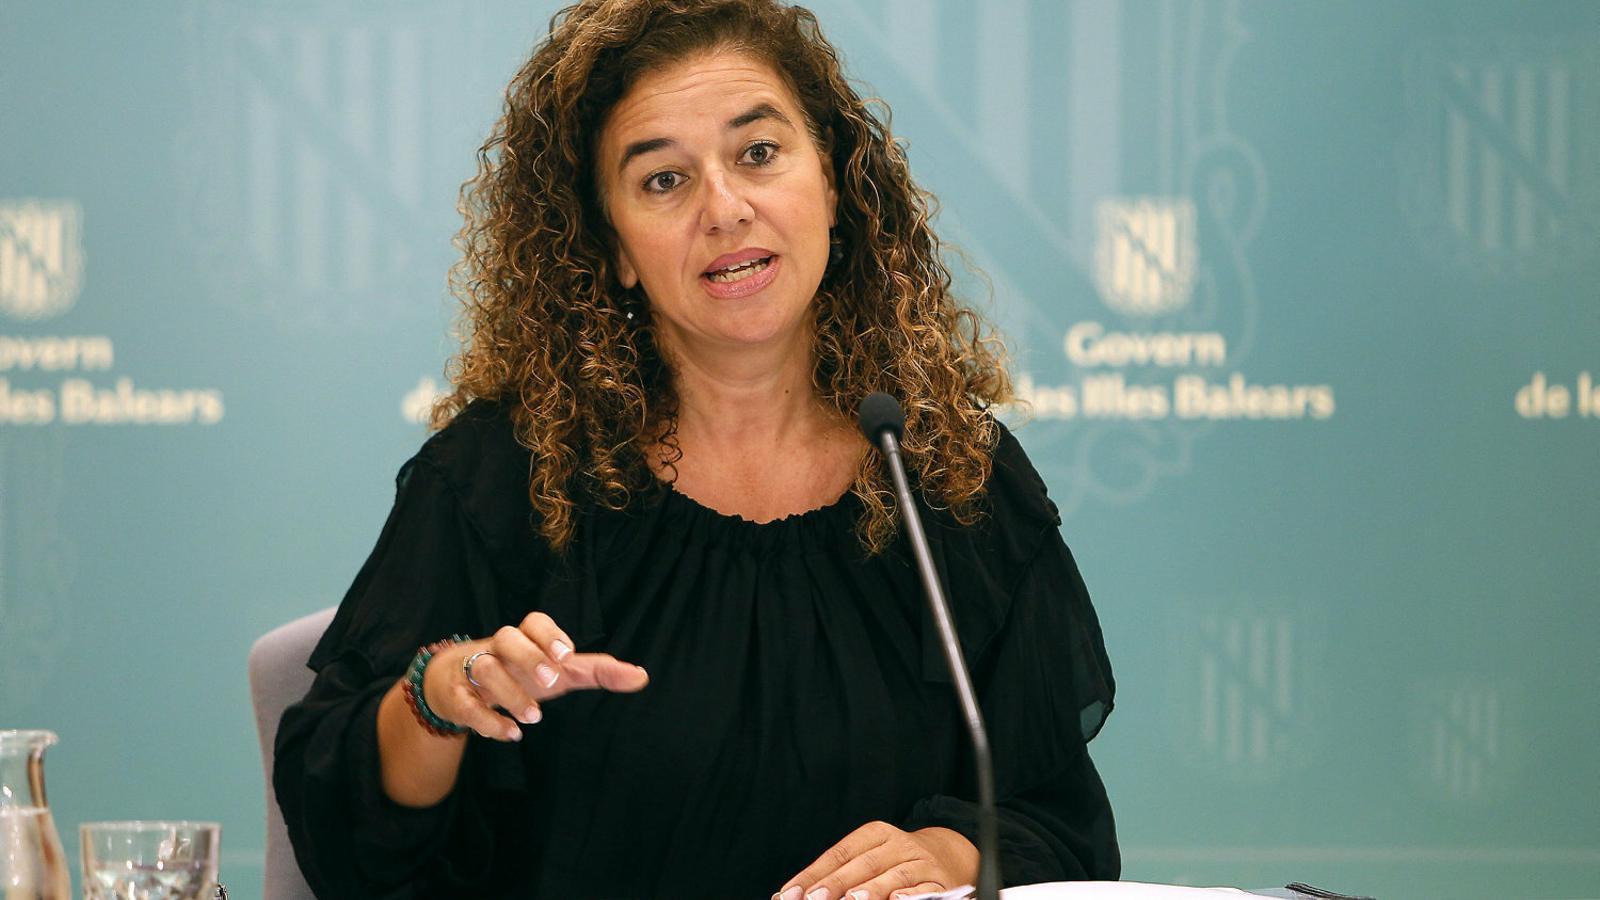 Pilar Costa